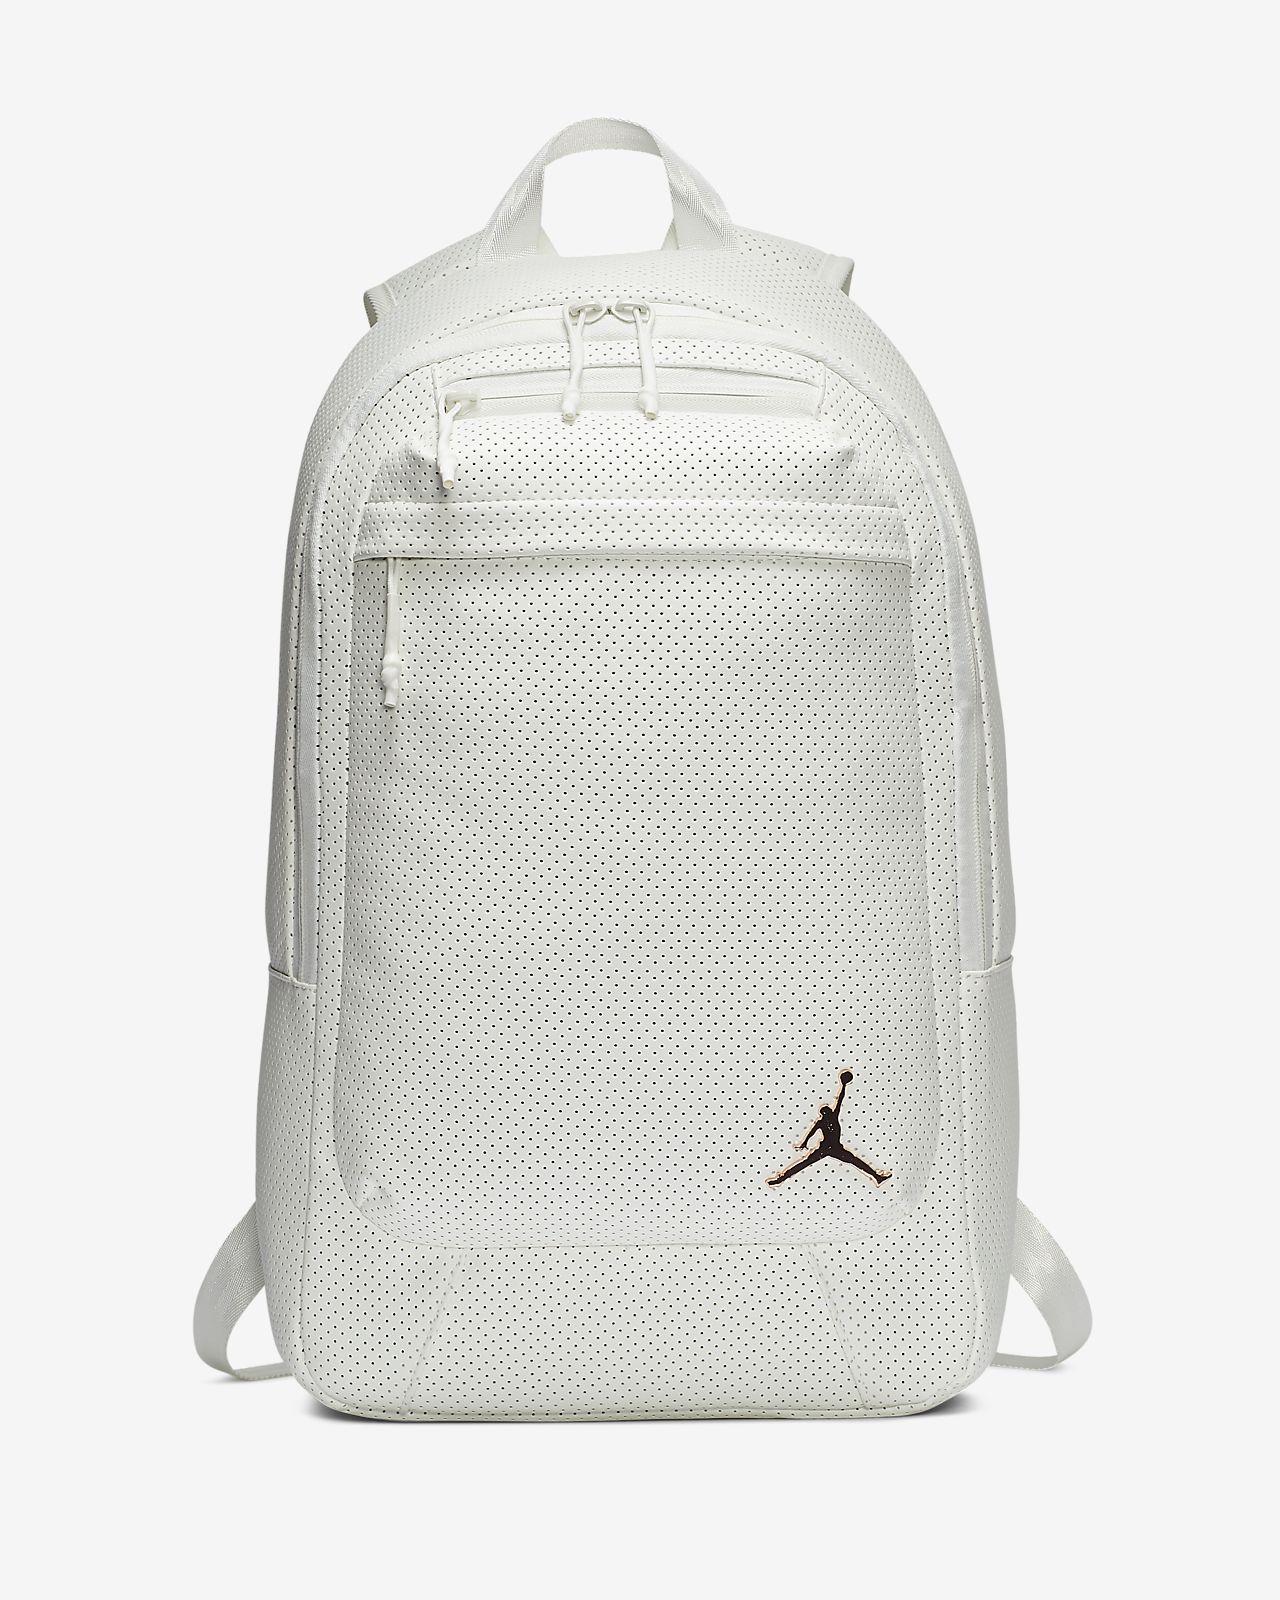 498eb5ef0a9 Low Resolution Jordan Legacy Backpack Jordan Legacy Backpack